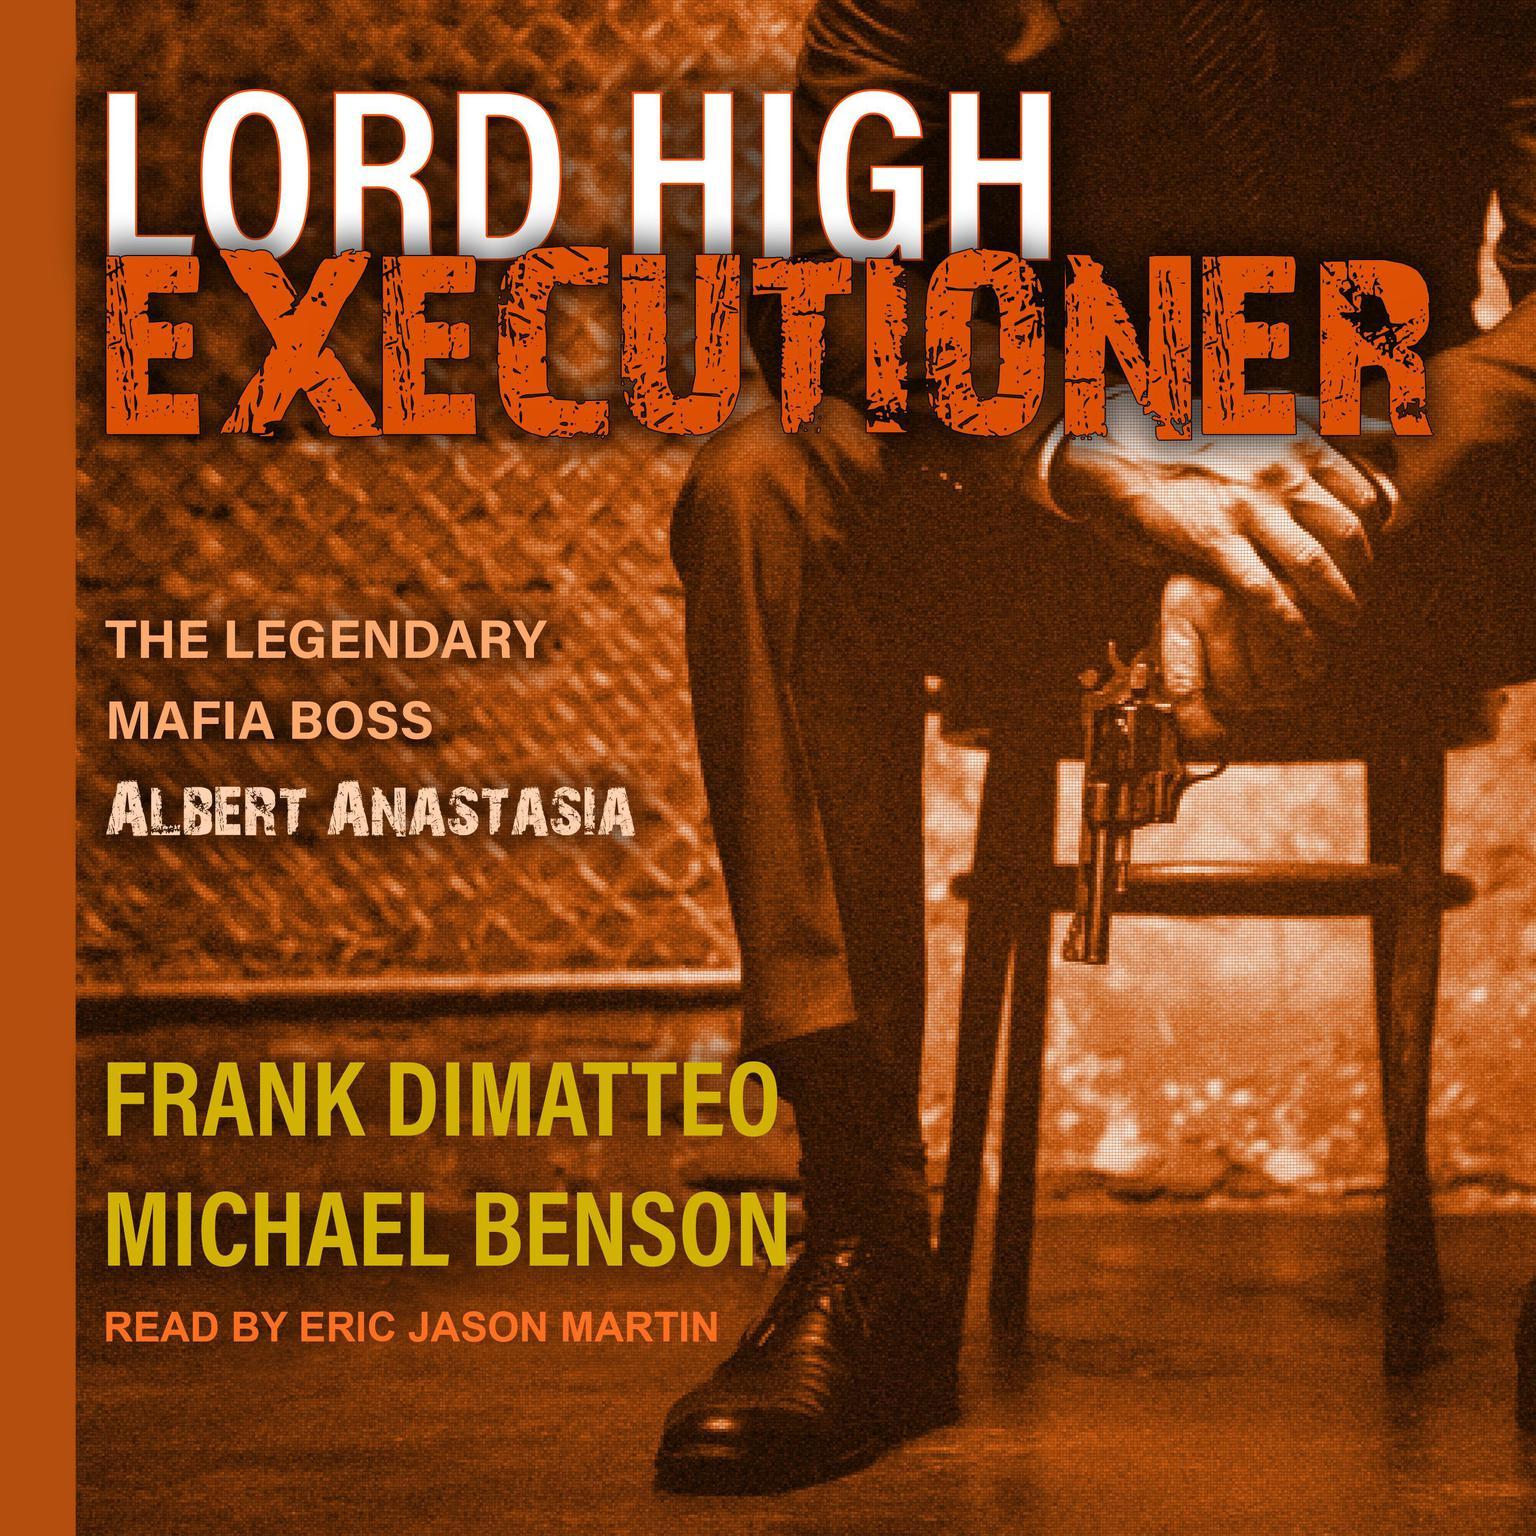 Lord High Executioner: The Legendary Mafia Boss Albert Anastasia Audiobook, by Frank DiMatteo